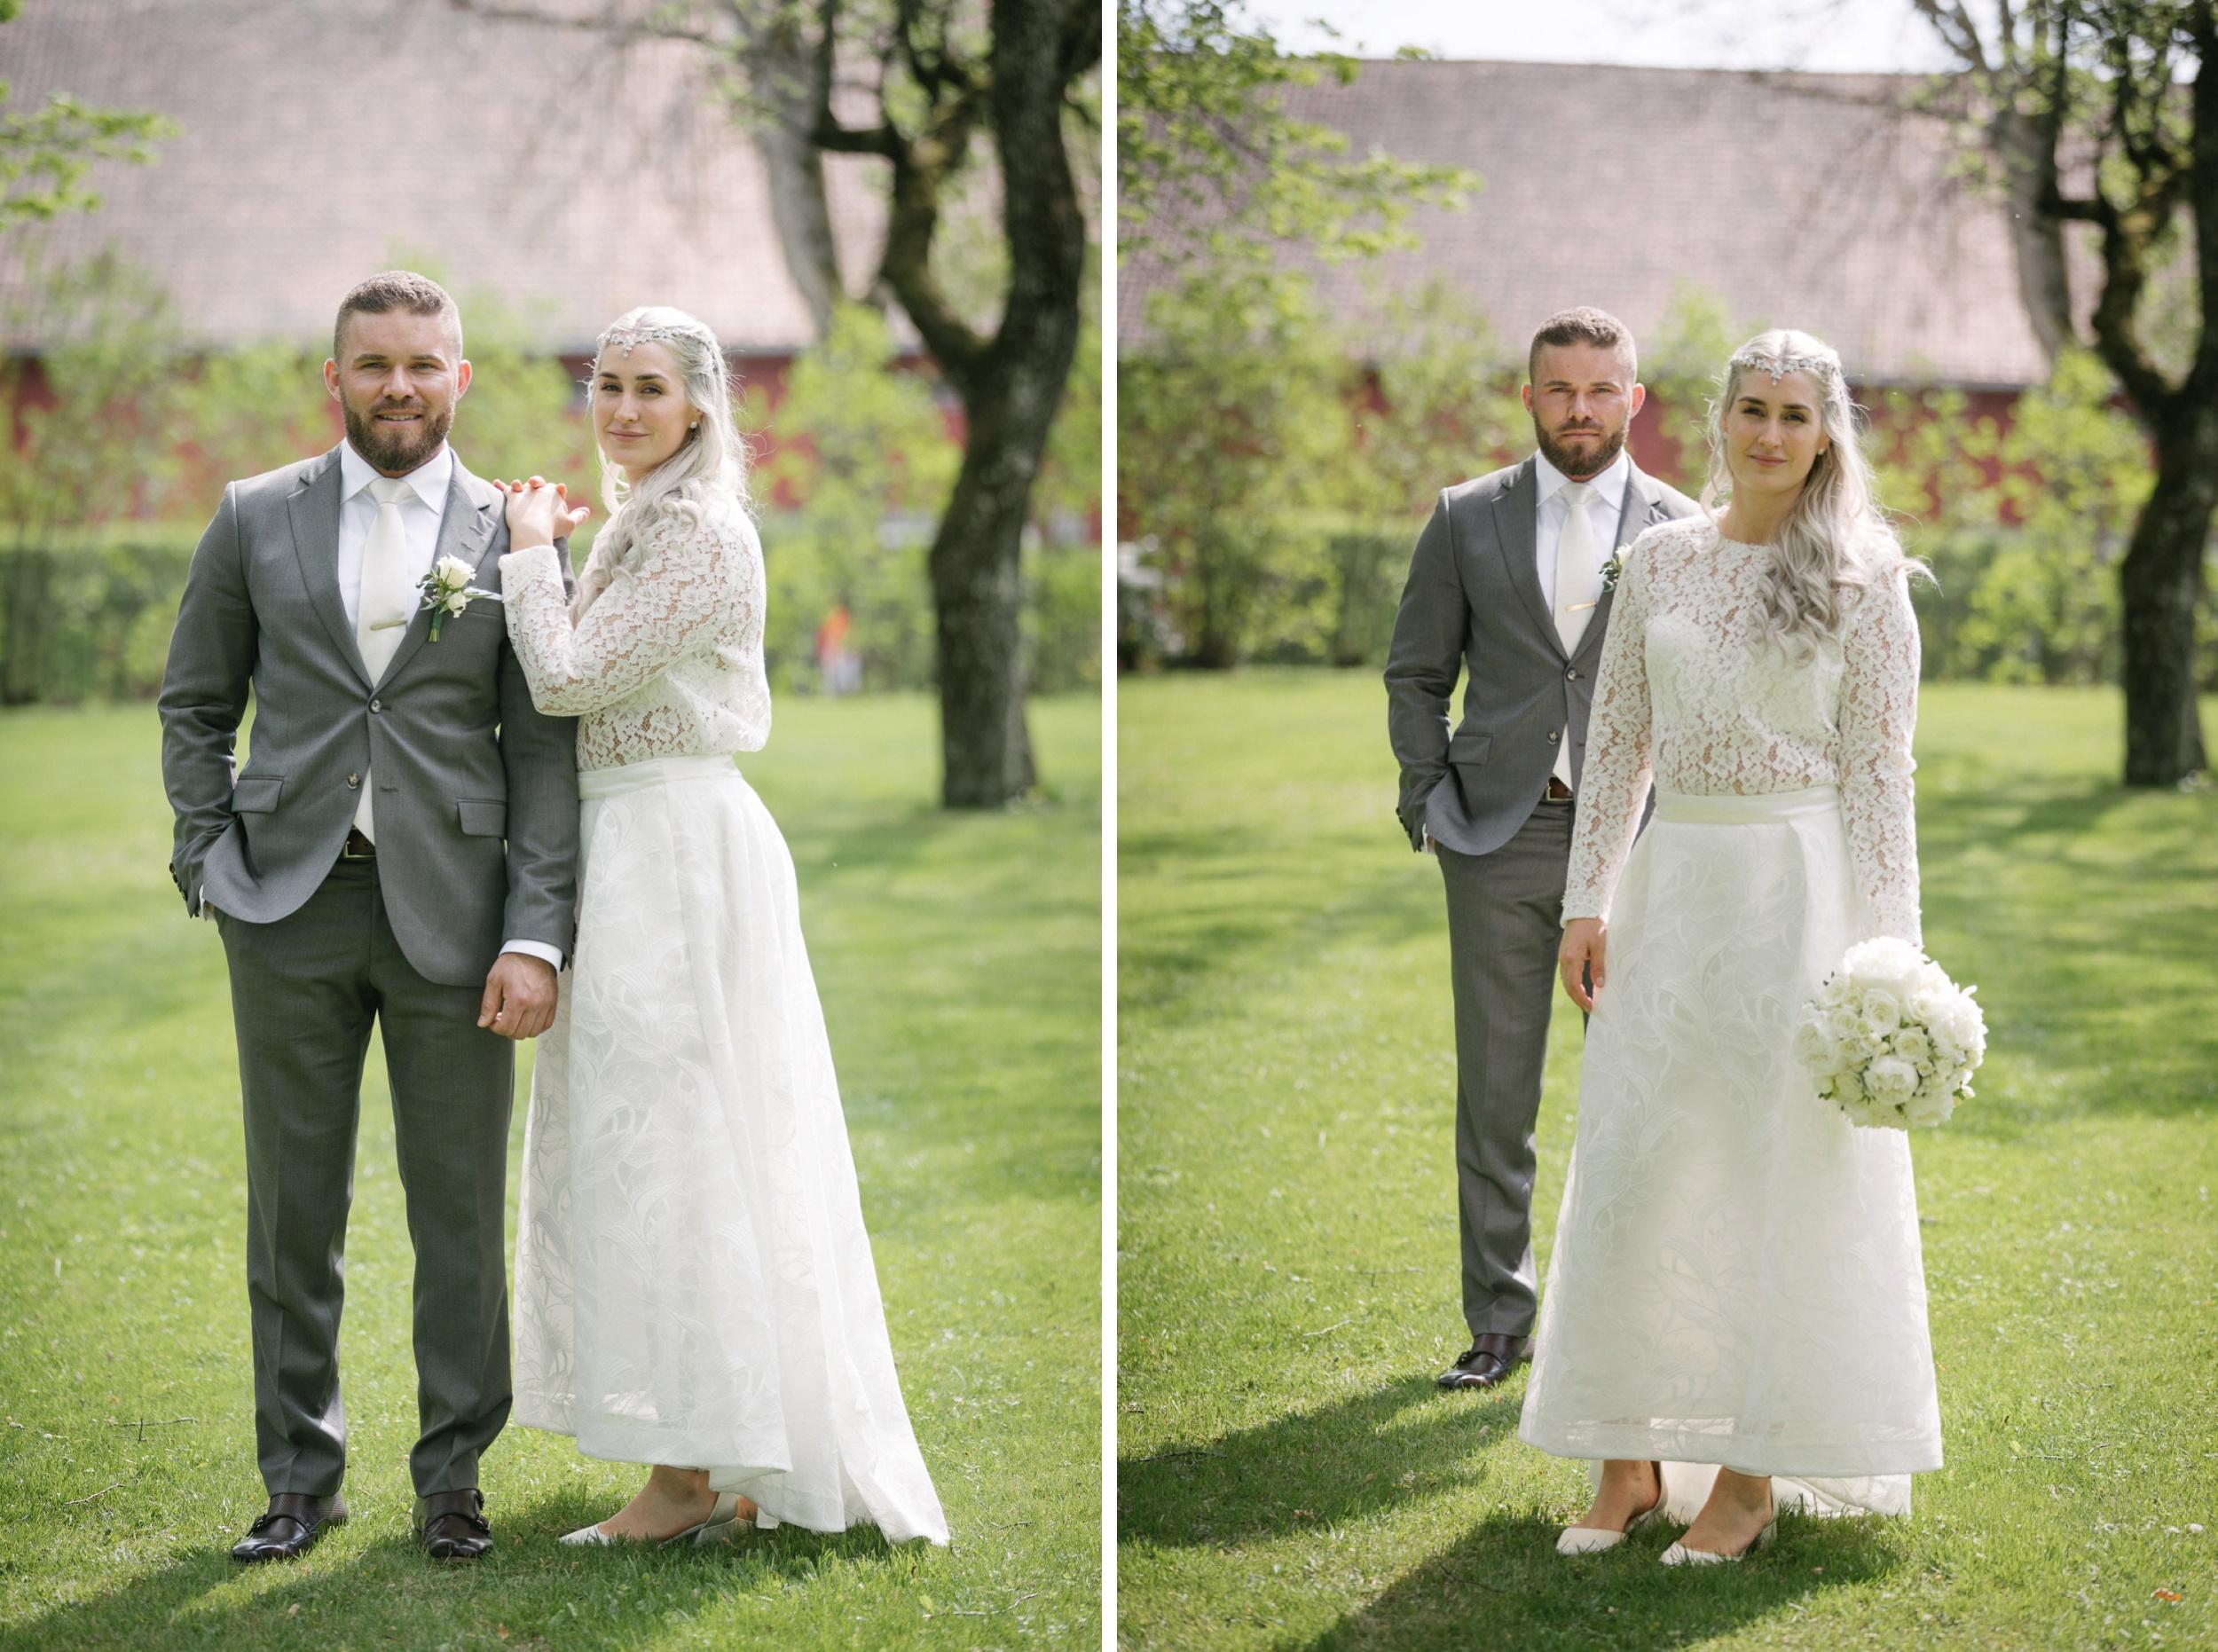 bryllup-bryllupsfotografering-bryllupsfotograf-sarpsborg-20170520-_H2A1172Camilla-og-ruben_WEB.jpg